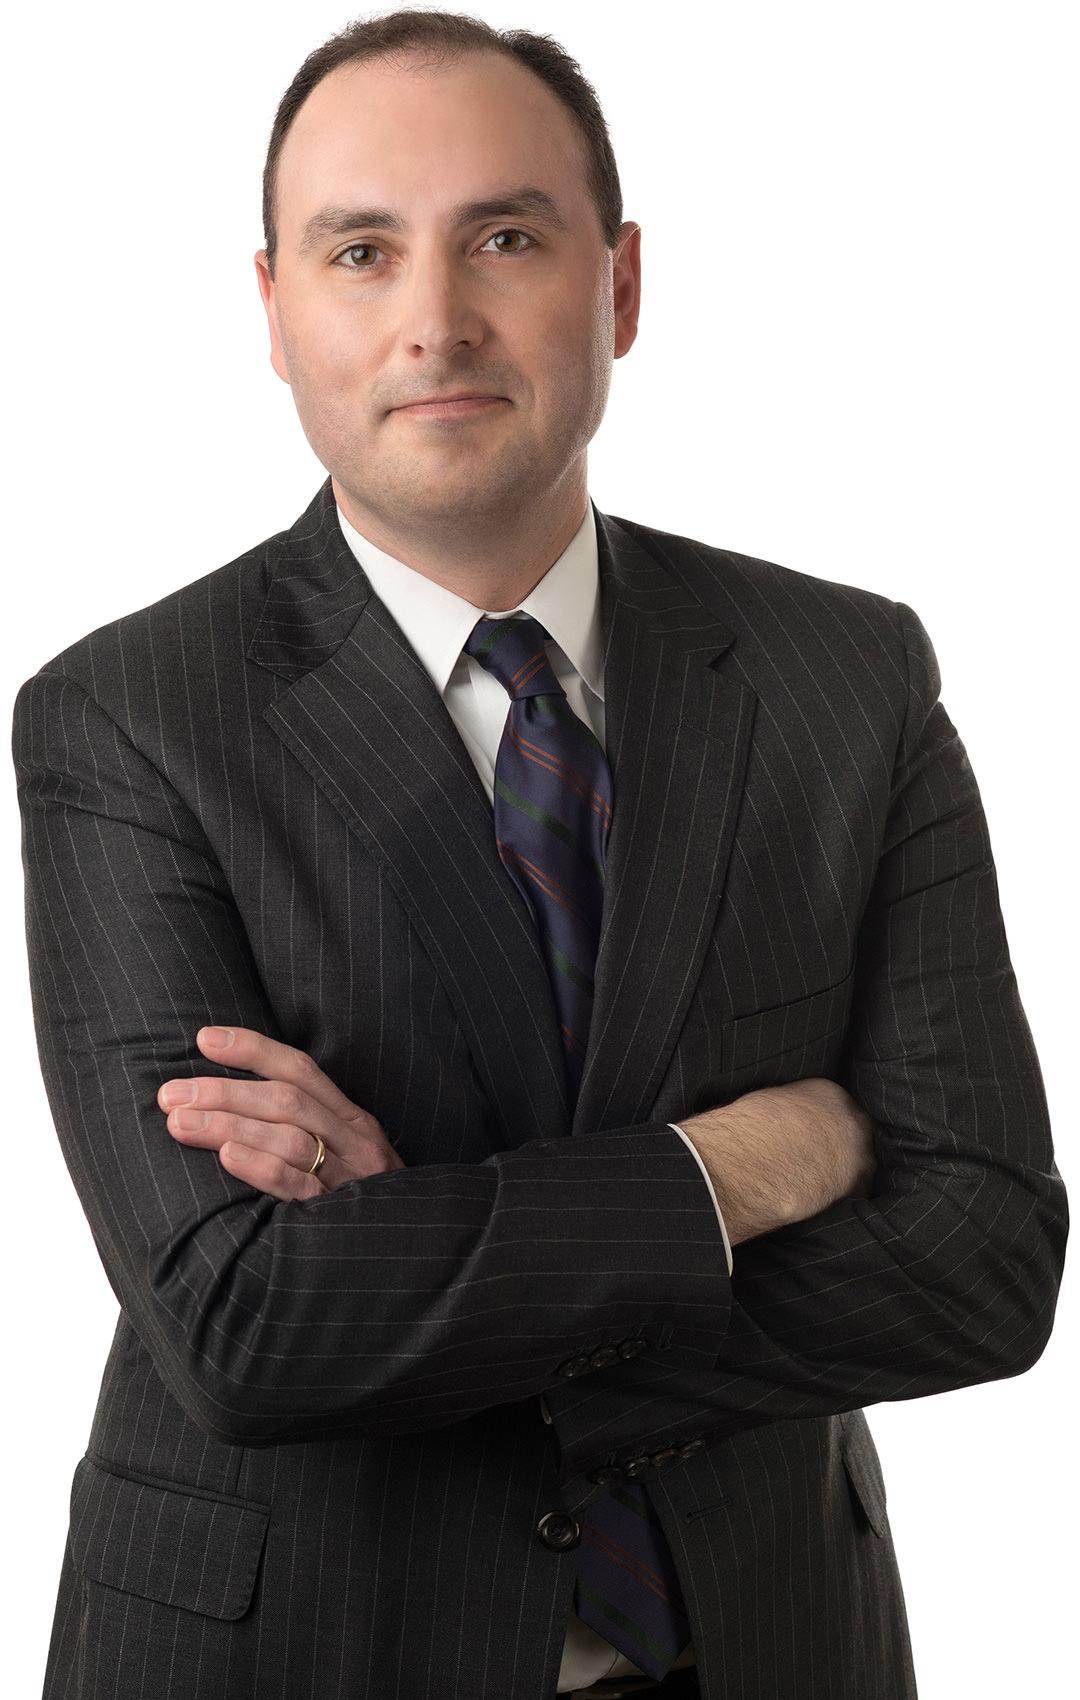 Jeremy C. Hodges